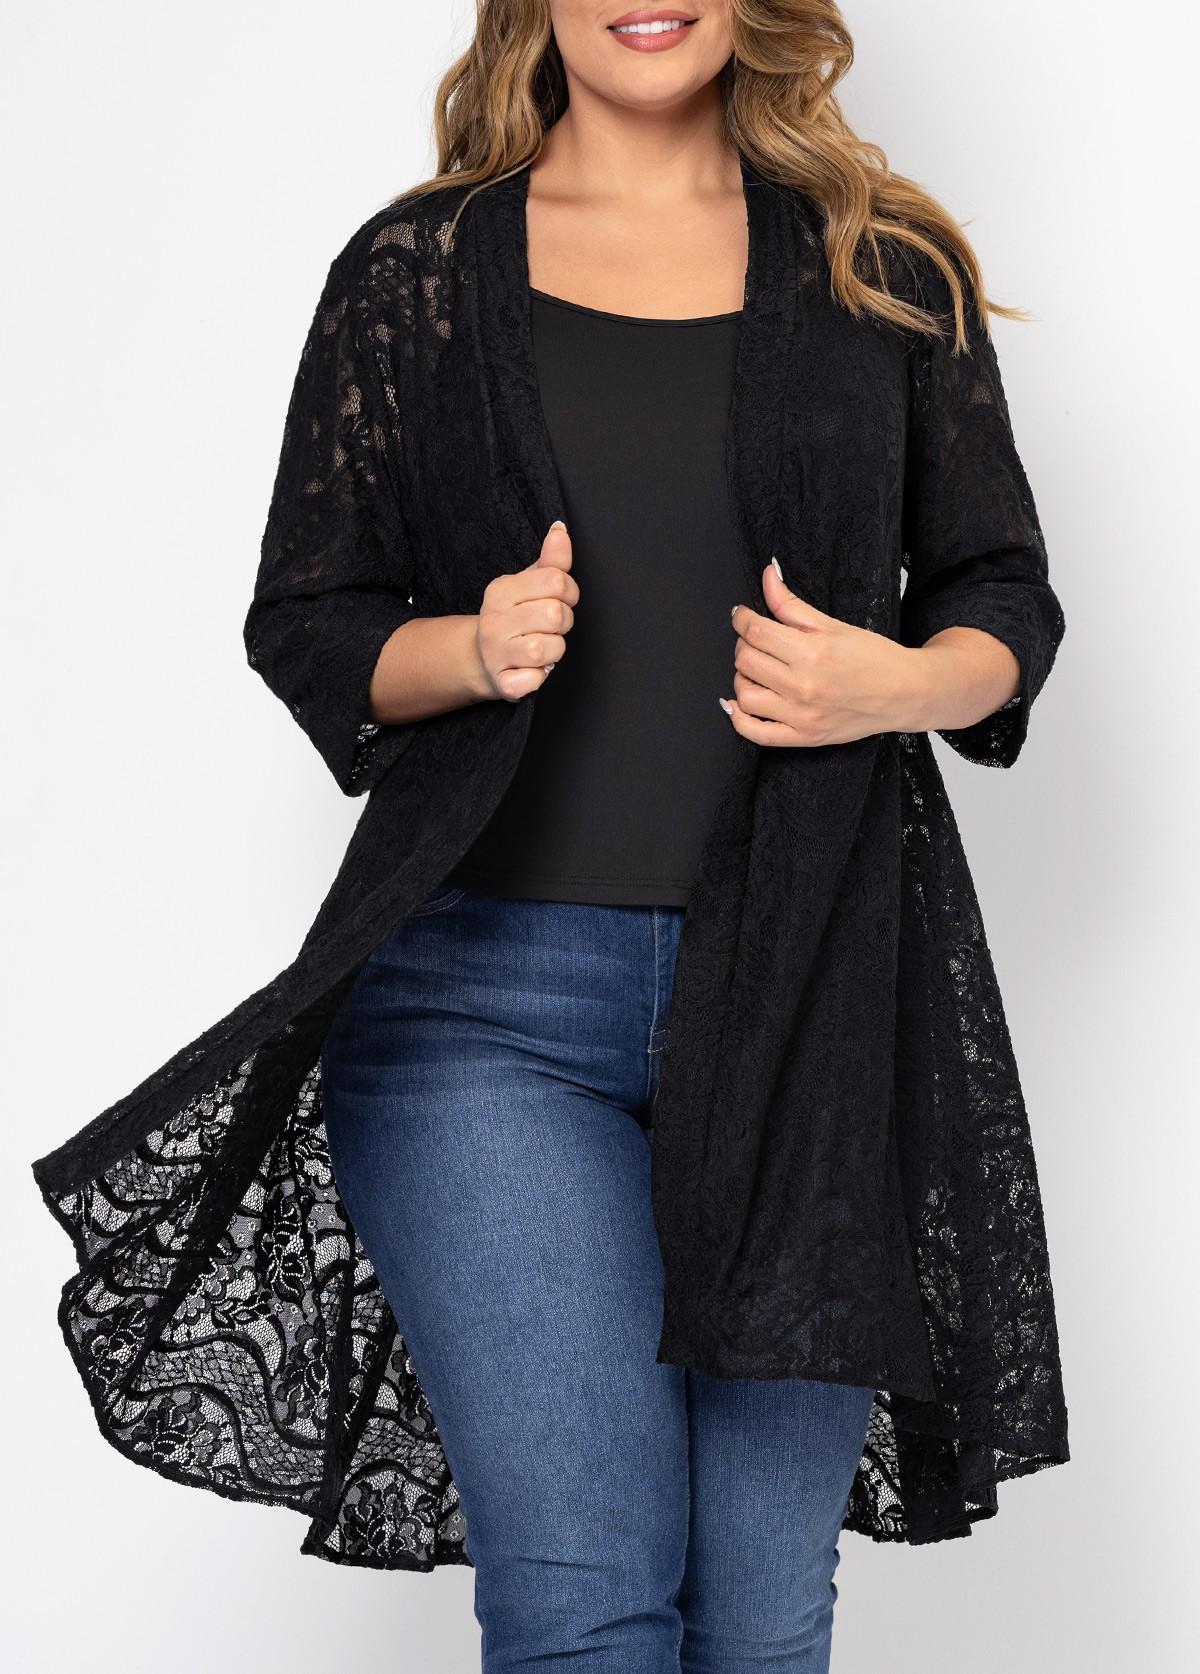 ROTITA Lace Stitching Solid Plus Size Cardigan